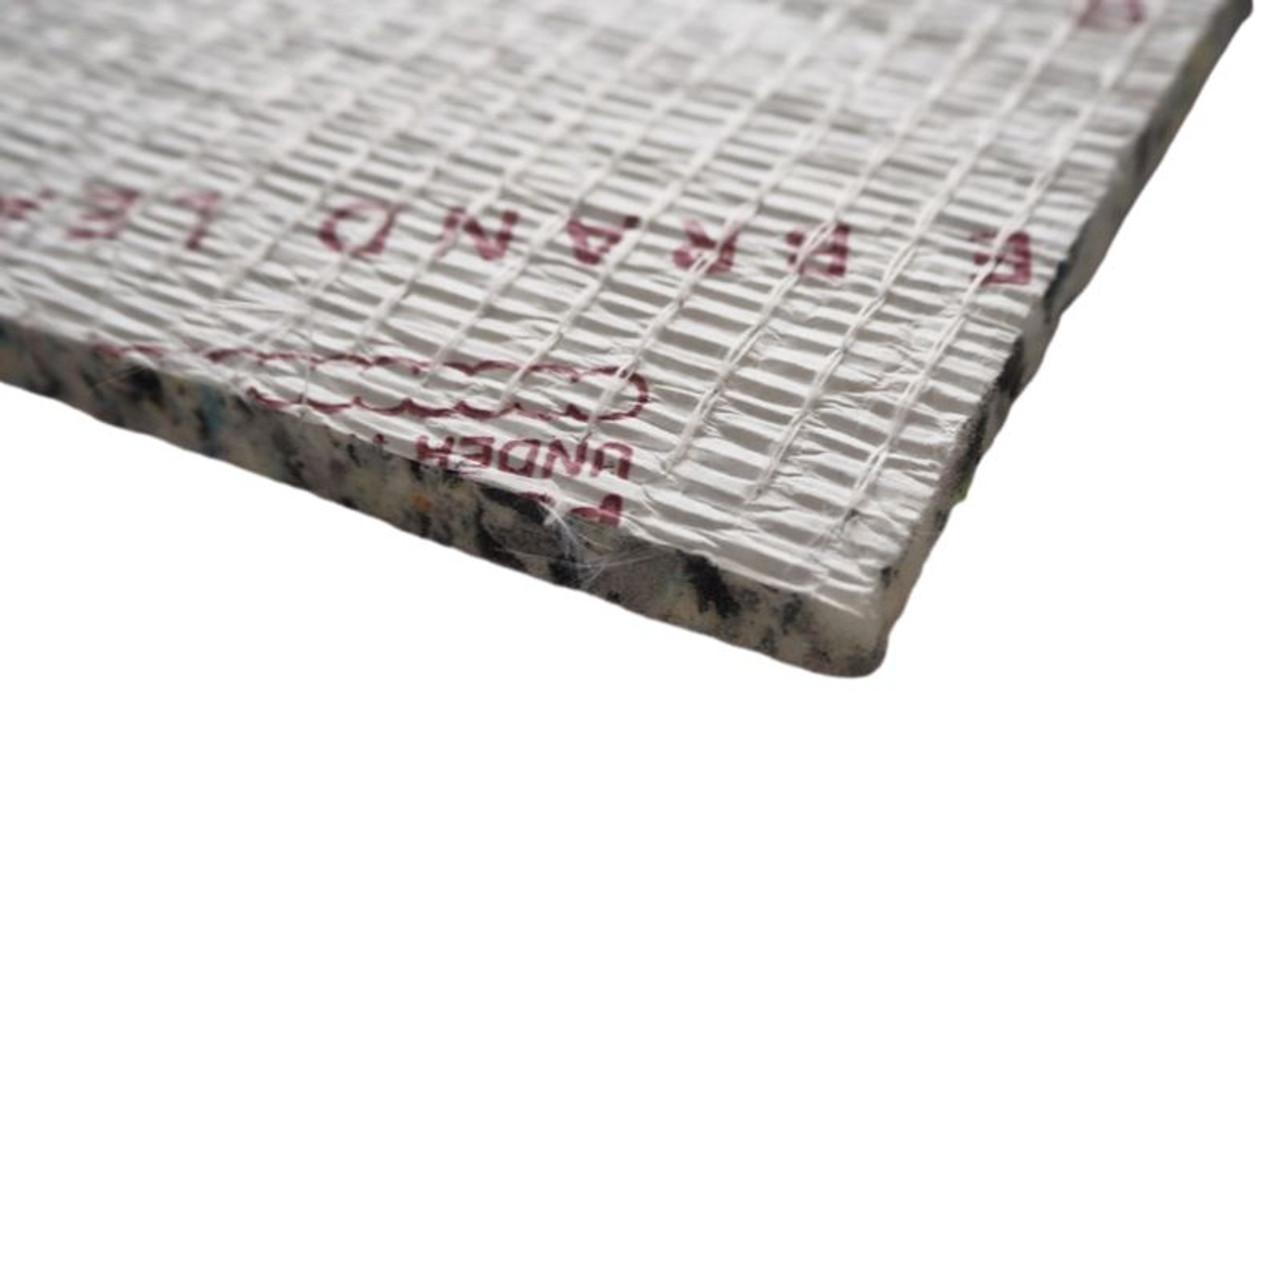 Cloud 9 Connoisseur 10mm Luxury Carpet Underlay 15m2 Roll Carpet And Flooring Online